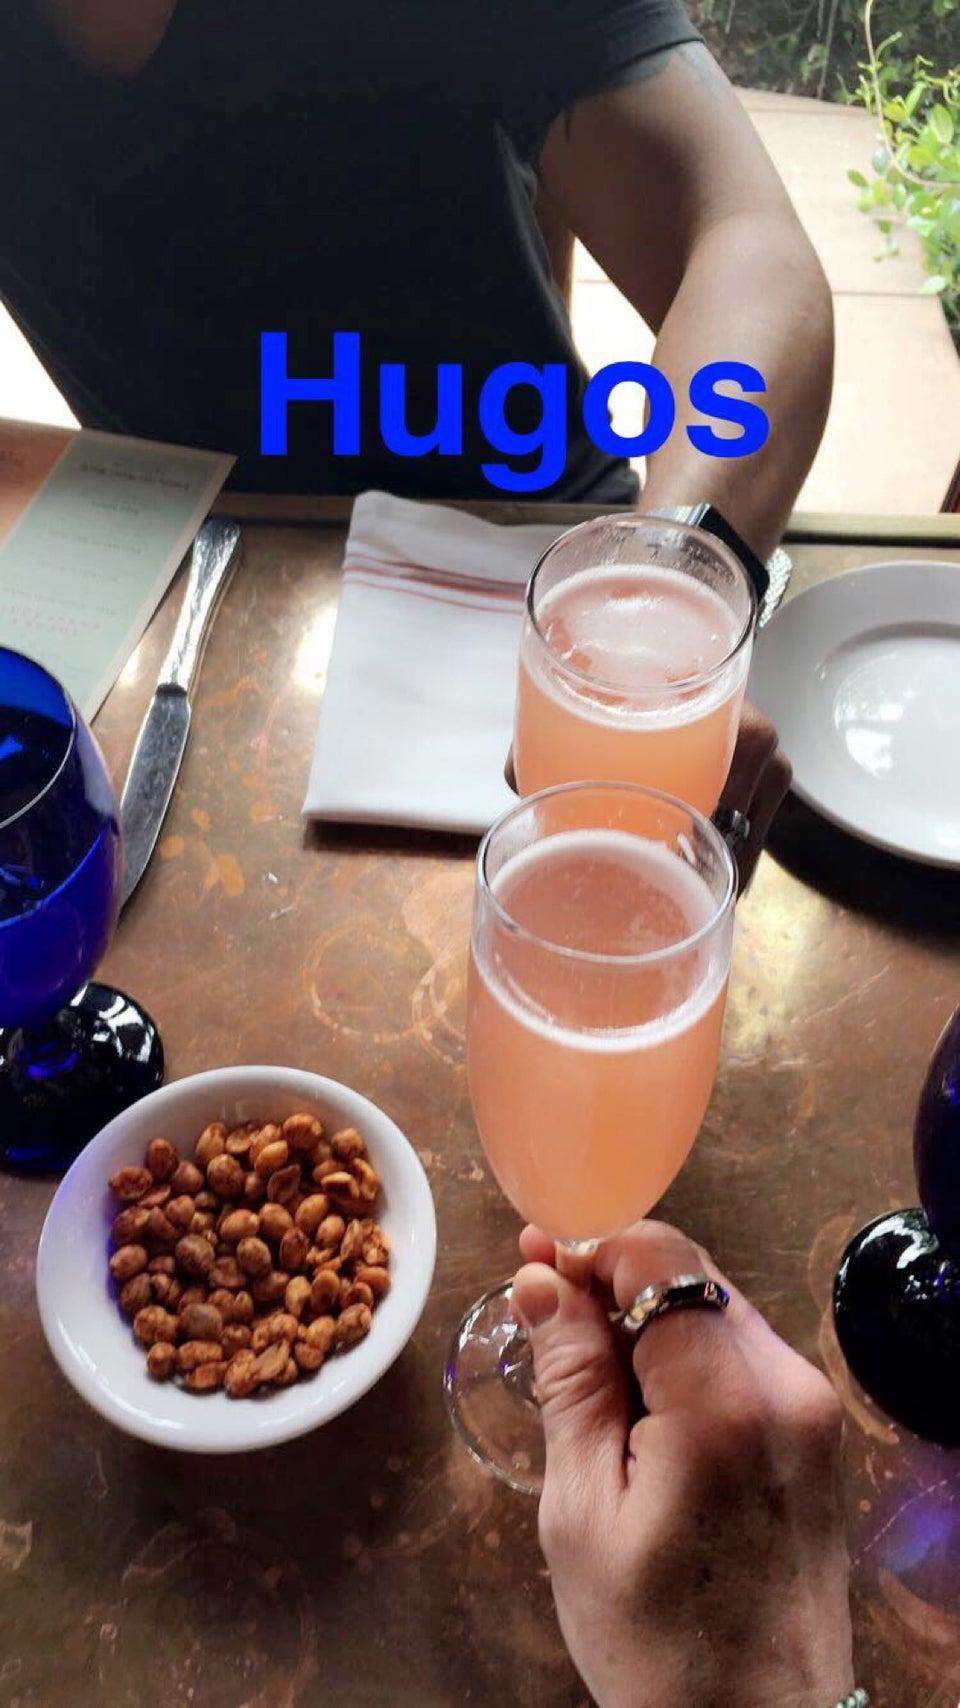 Photo of Hugo's